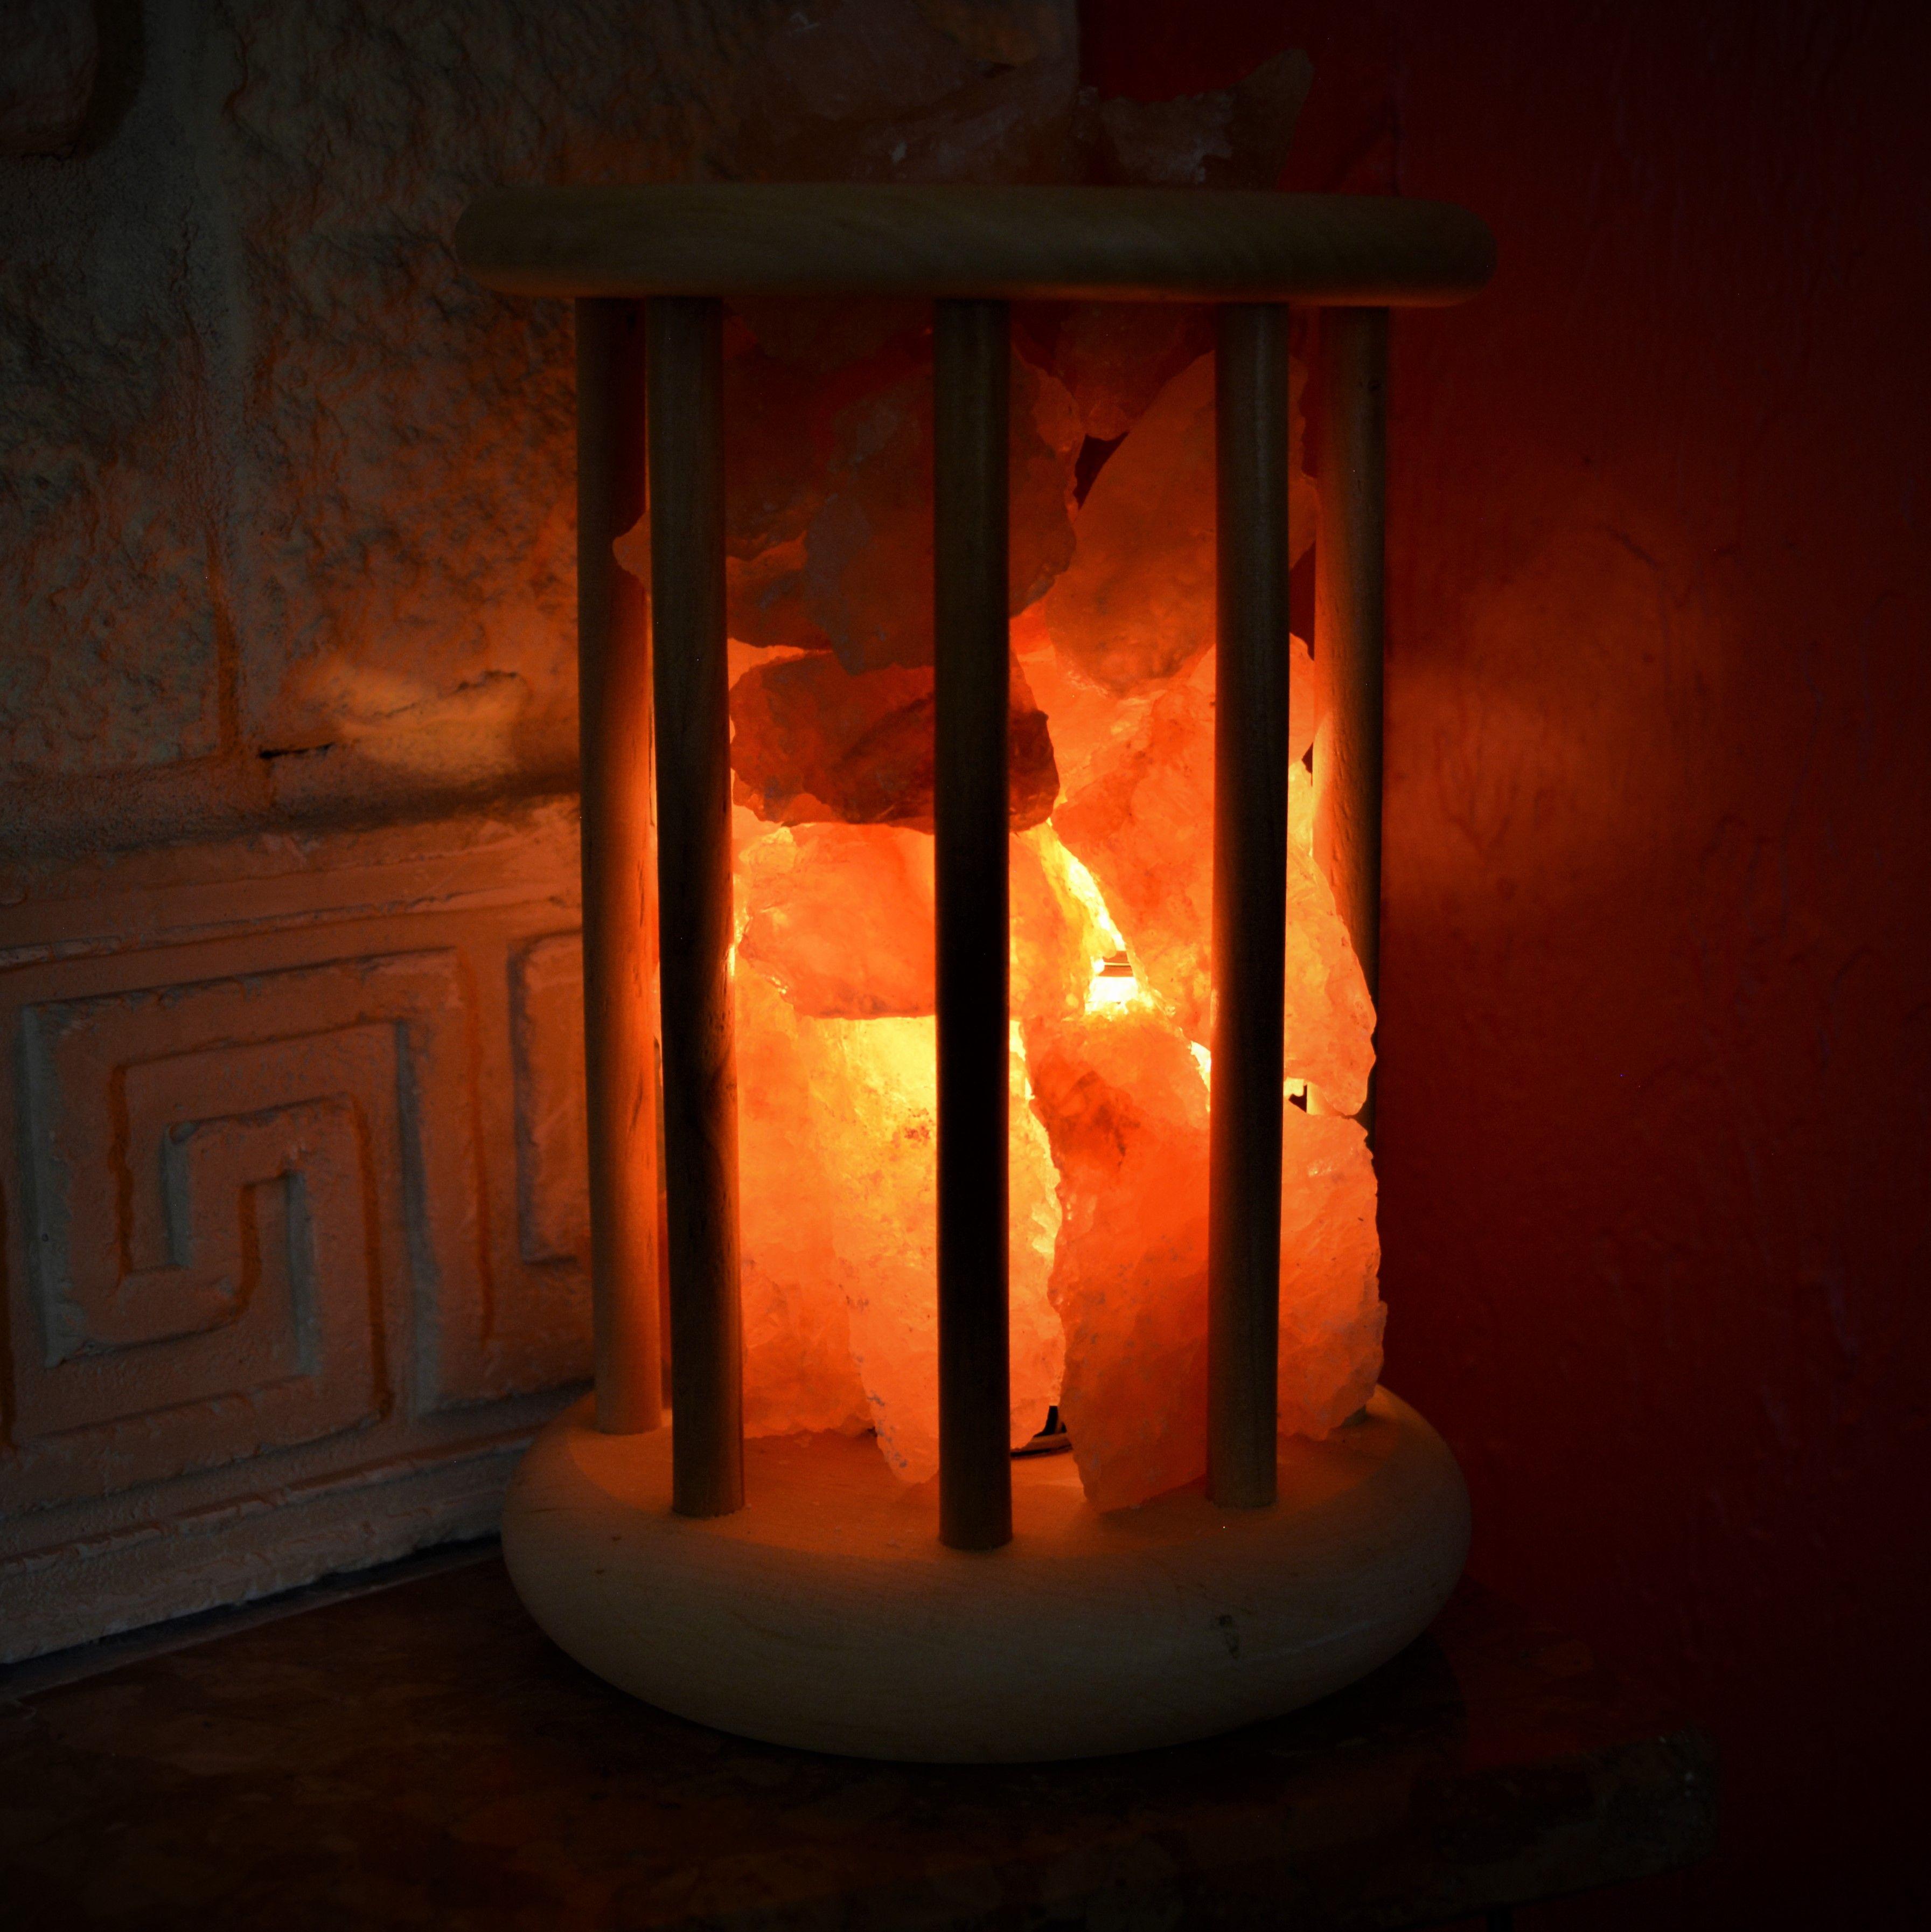 Lampa Solna Koszyk Jonizator 2 3kg Sol Klodawska 8105522948 Oficjalne Archiwum Allegro Candle Sconces Salt Lamps Wall Lights